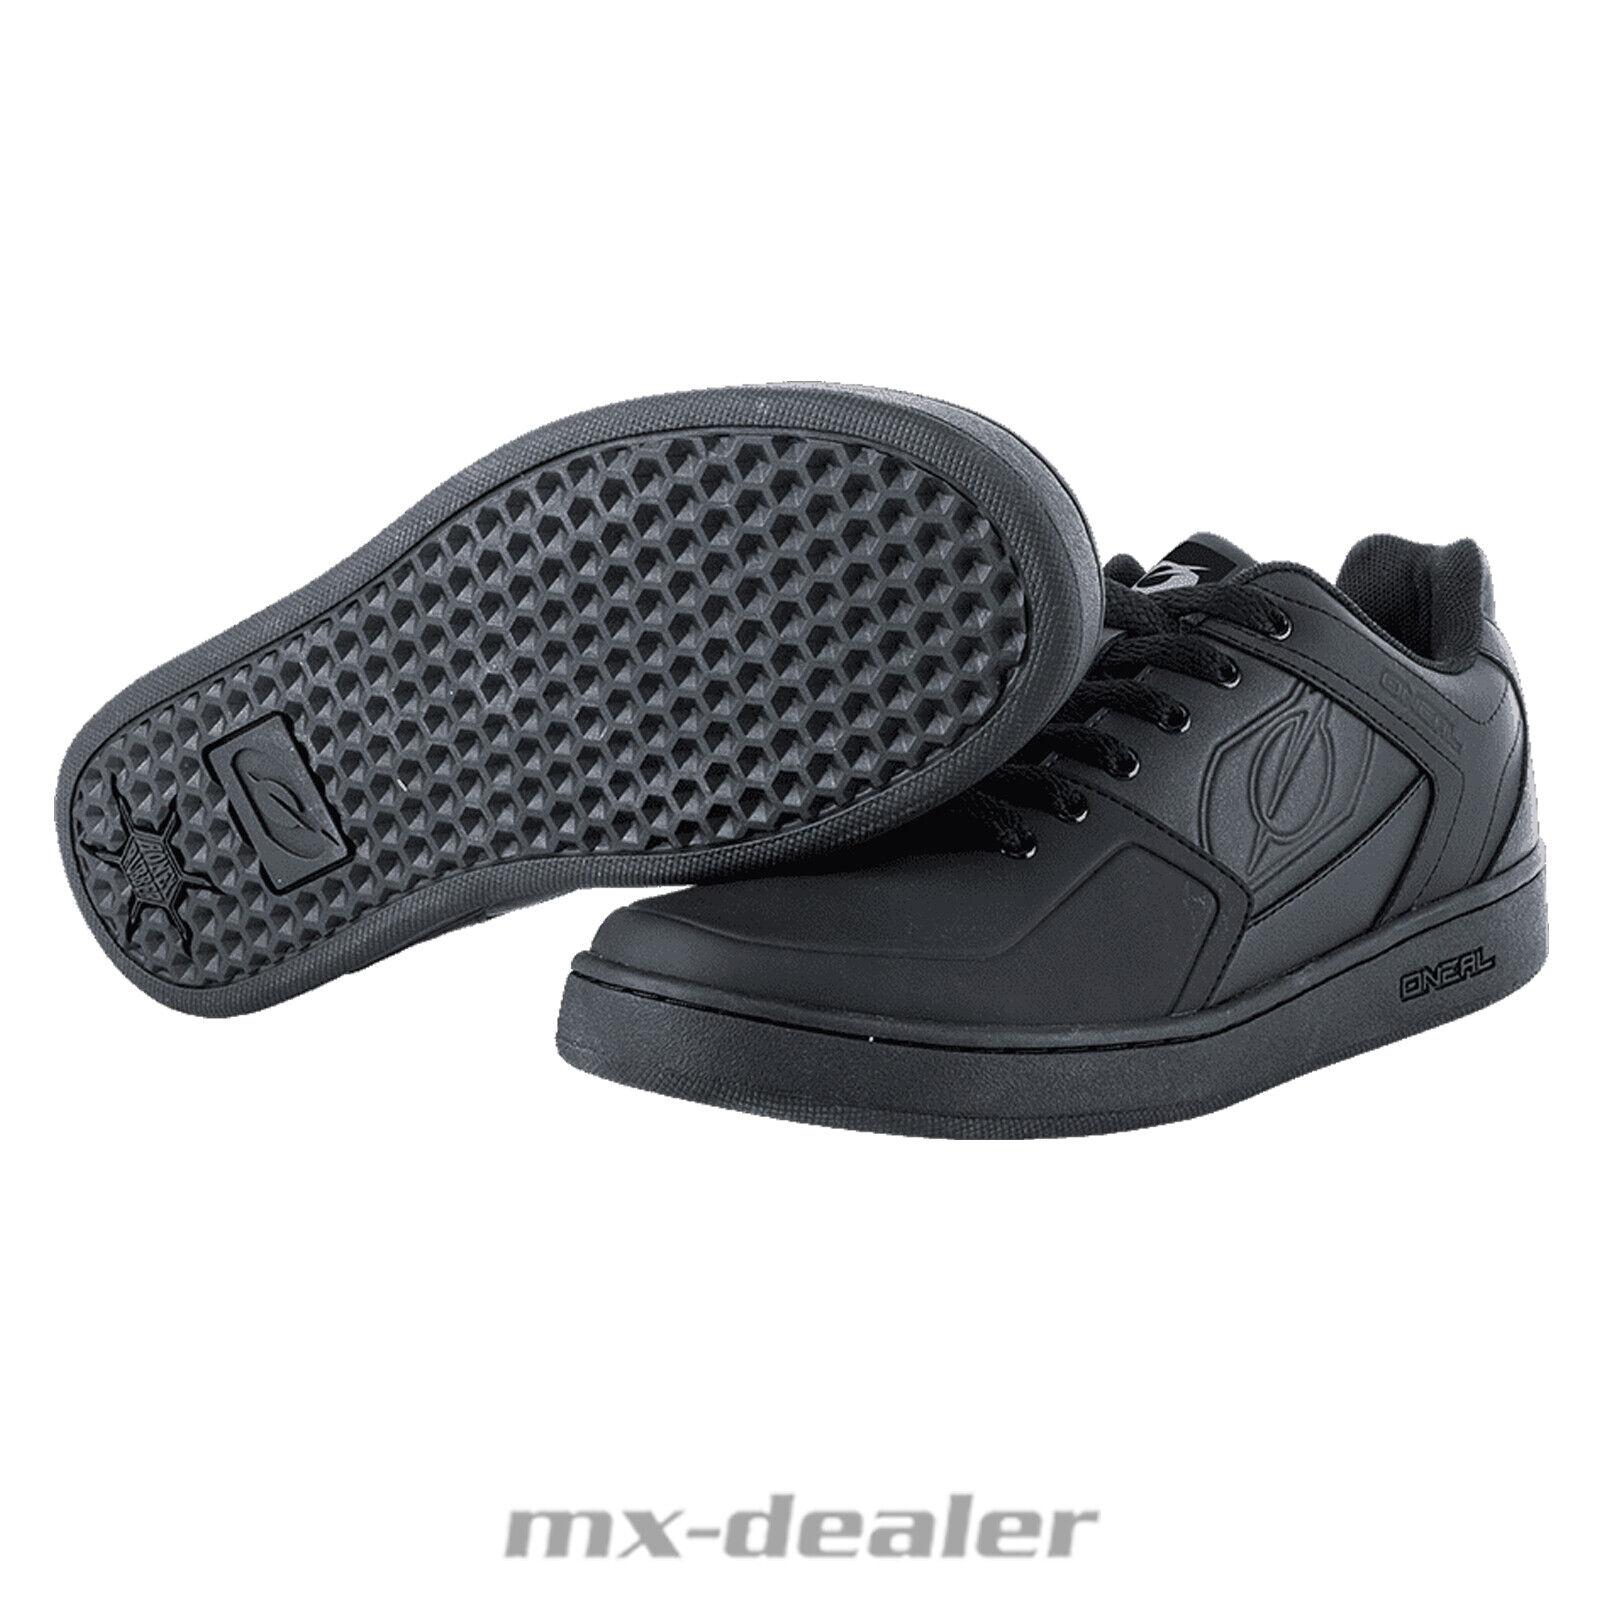 Oneal Stinger II Flat Pedal Schuhe schwarz-weiß MTB Skate BMX DH Mountainbike